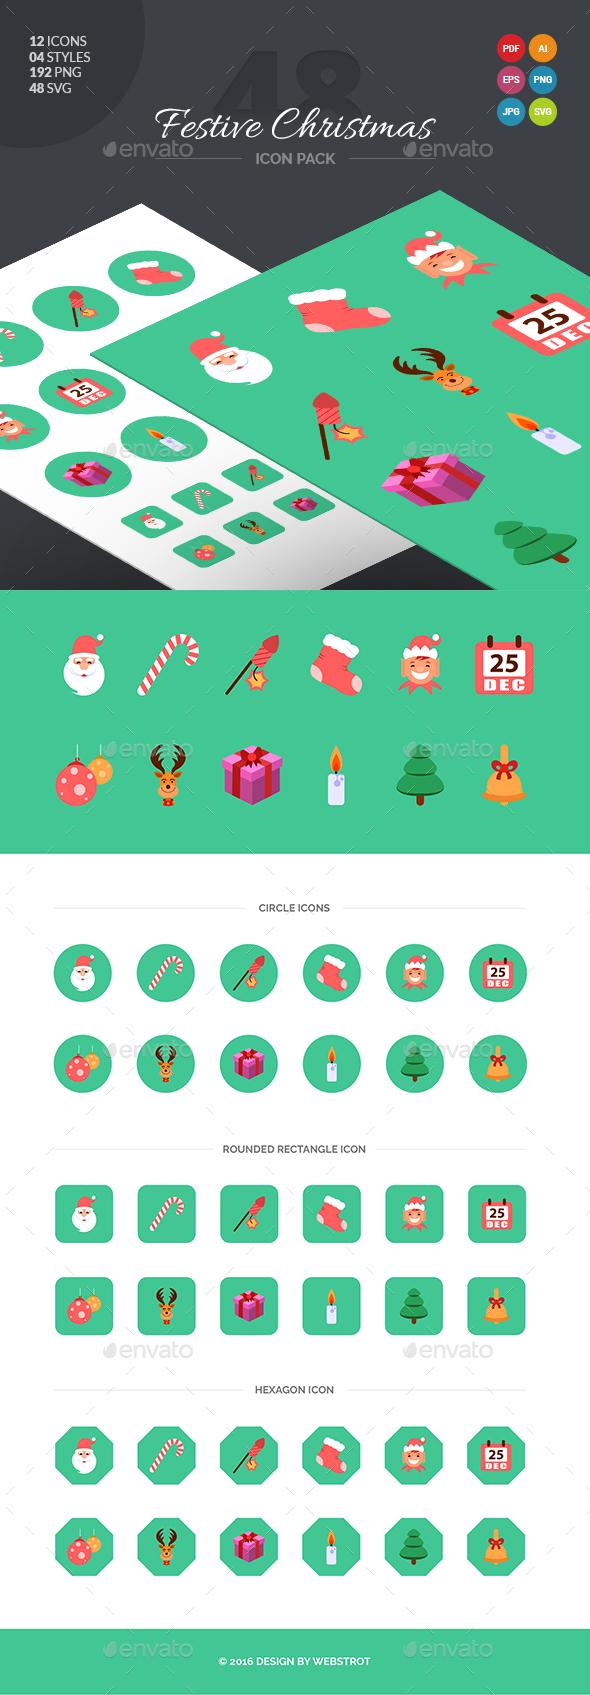 48 Festive Christmas Icon Pack - Seasonal Icons